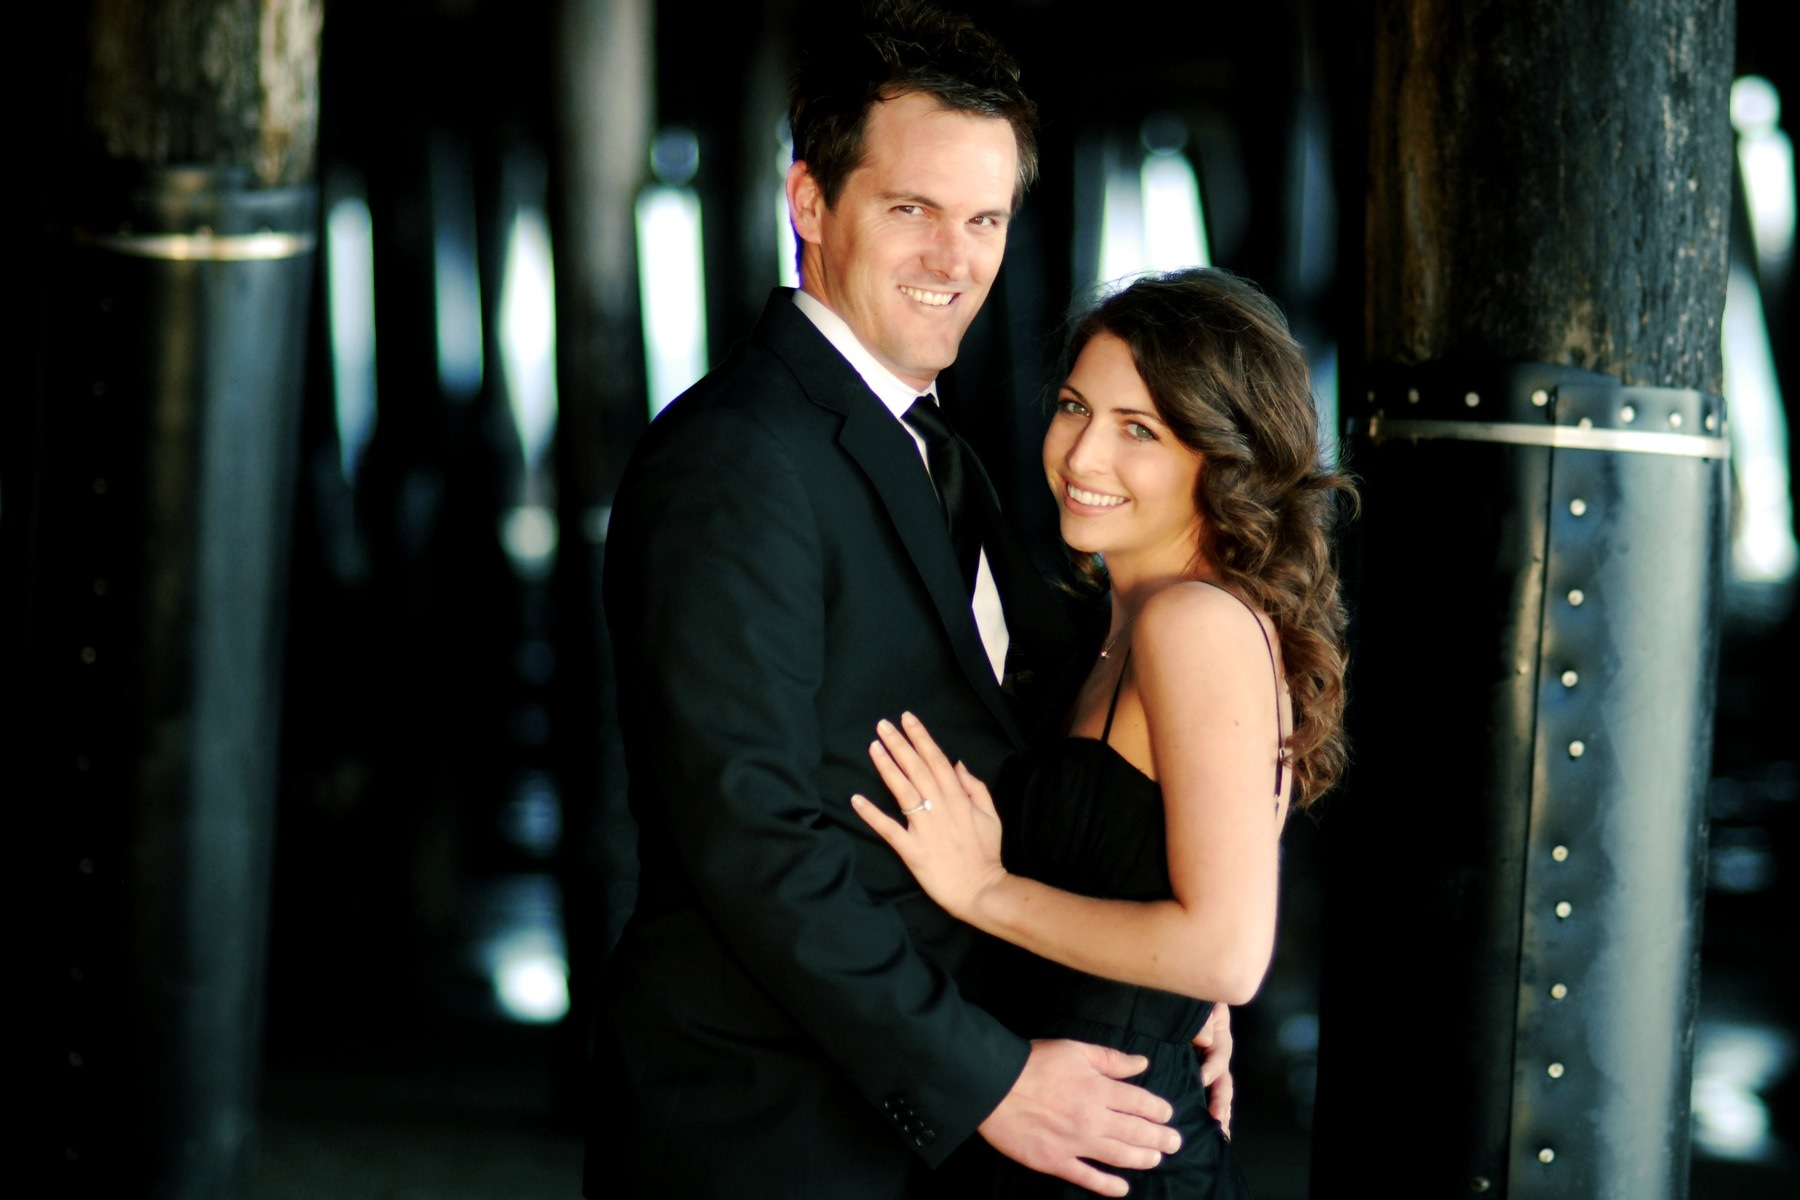 San Francisco Engagement Session Photographer.  Specializing in Bay Area (San Francisco, Peninsula, East Bay, Sonoma, & Napa) Wedding Photography